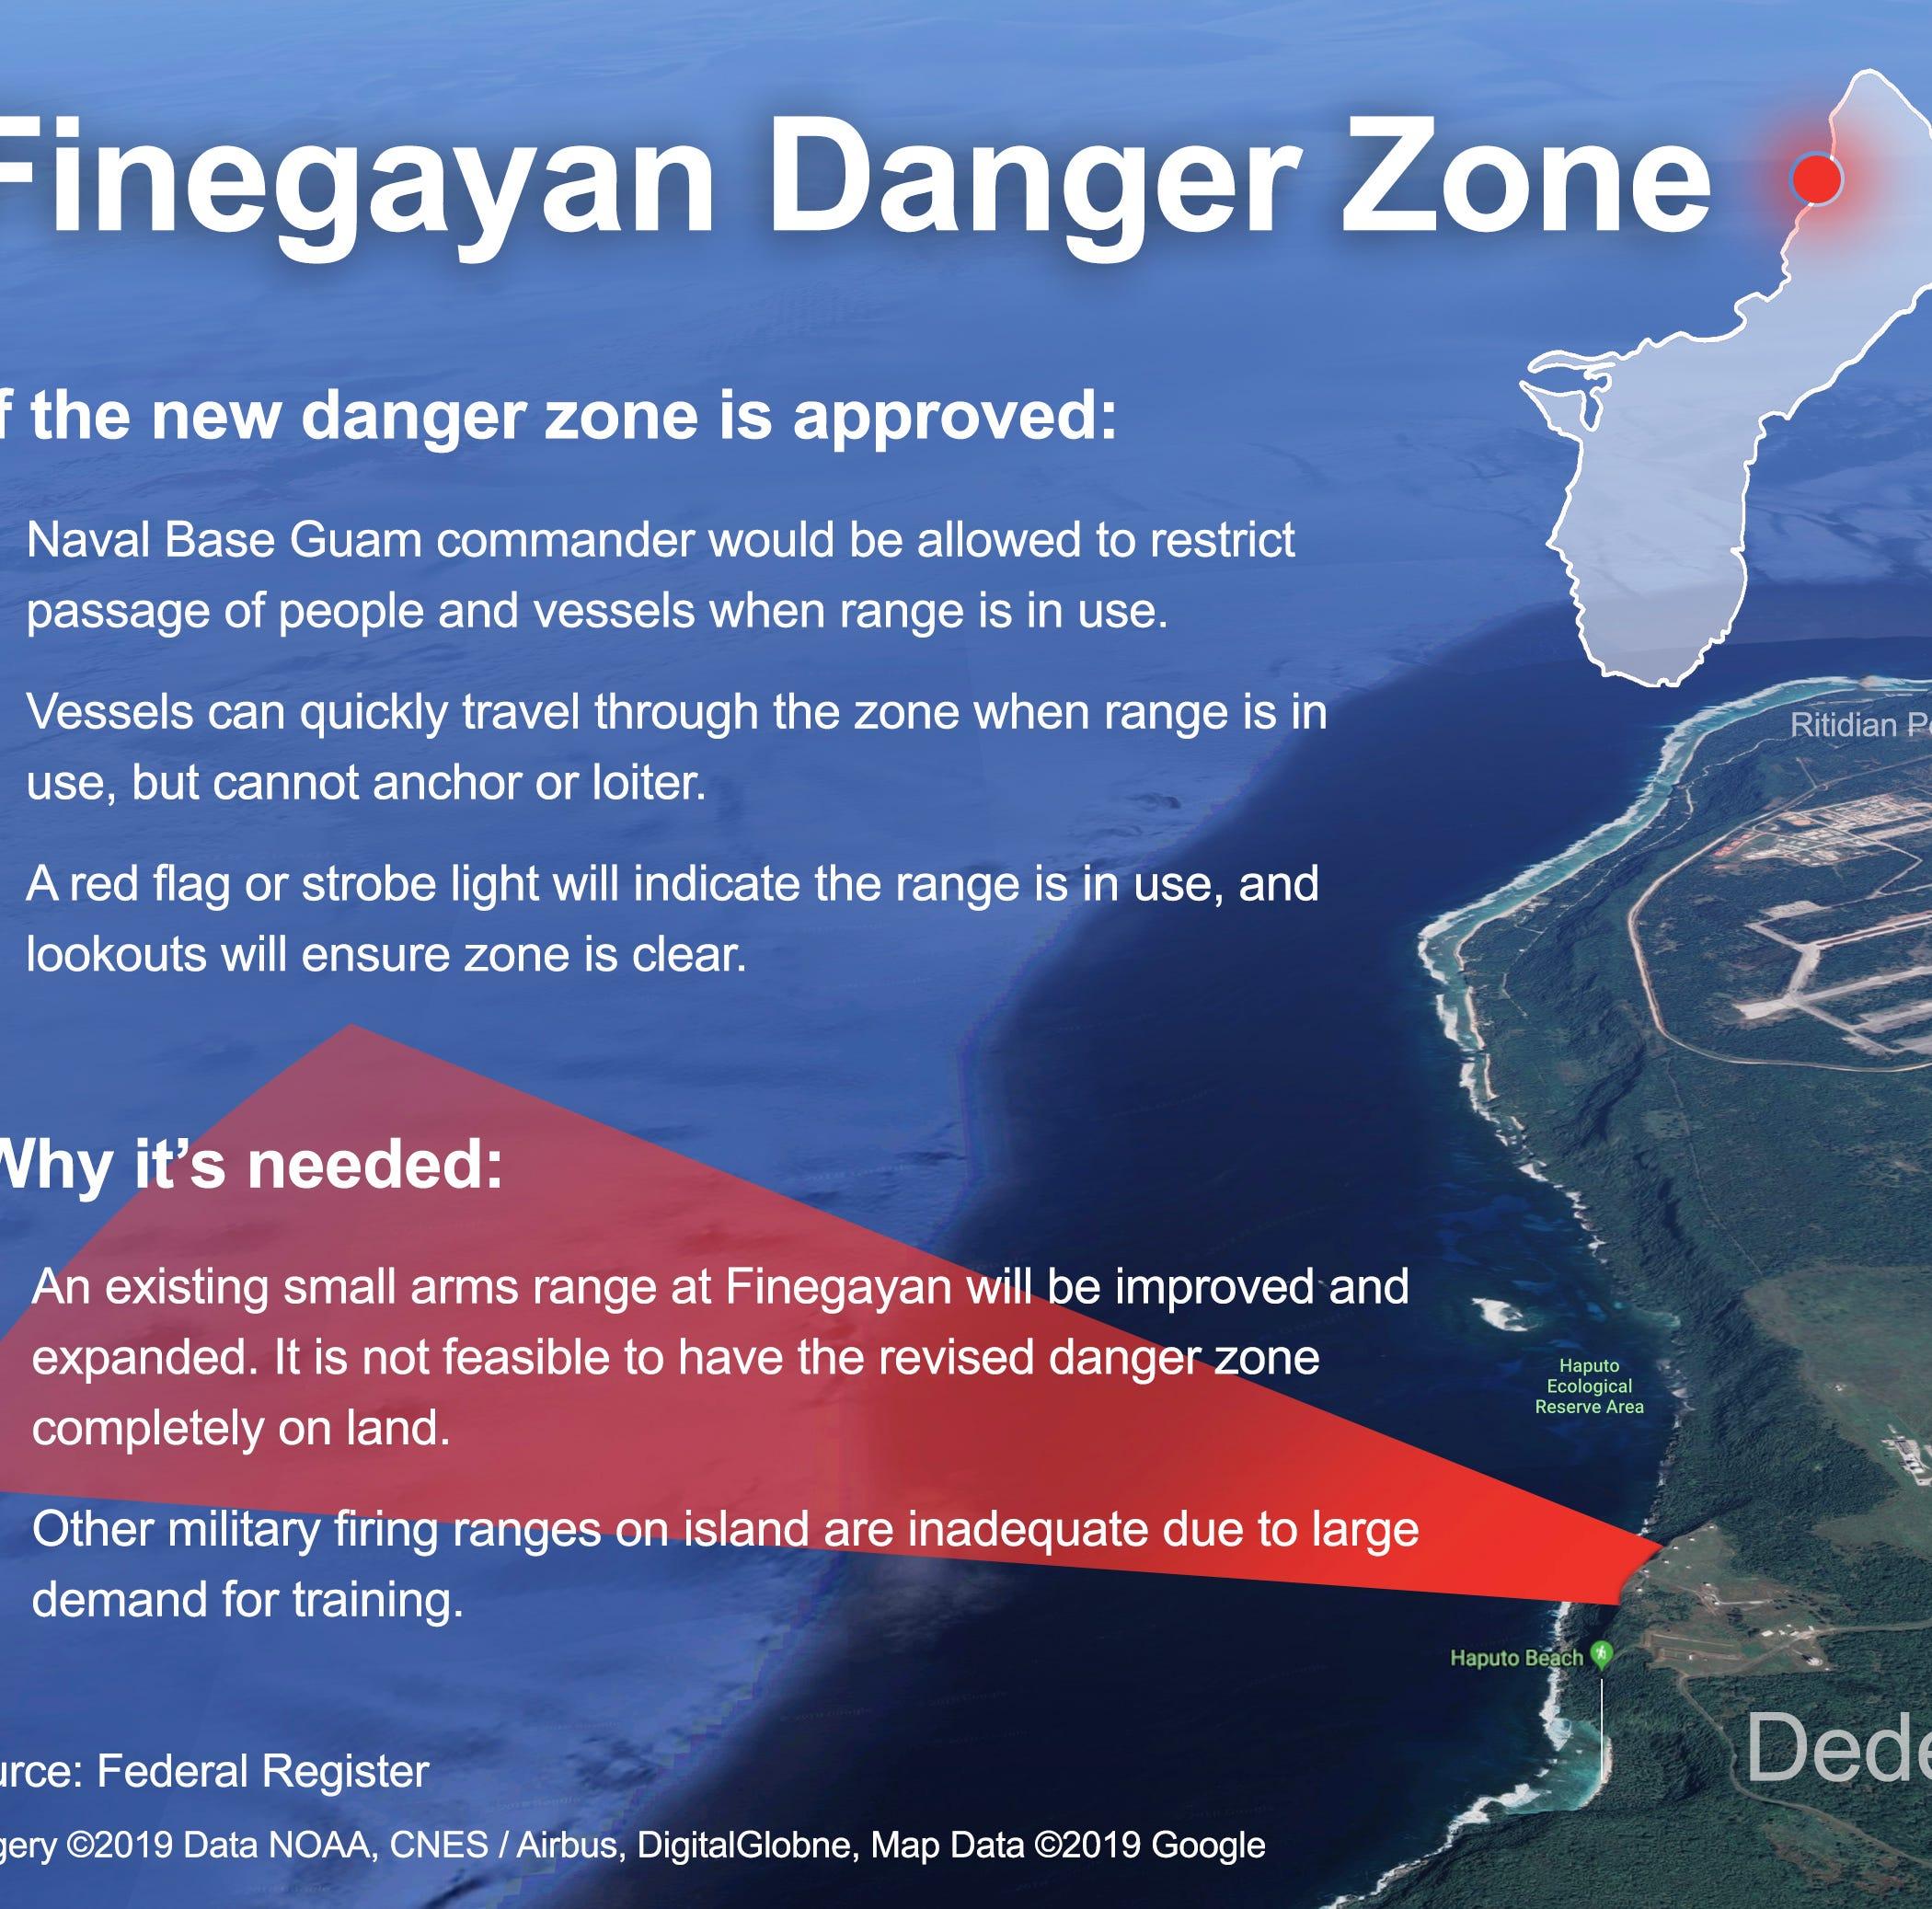 Finegayan danger zone plan draws more concerns